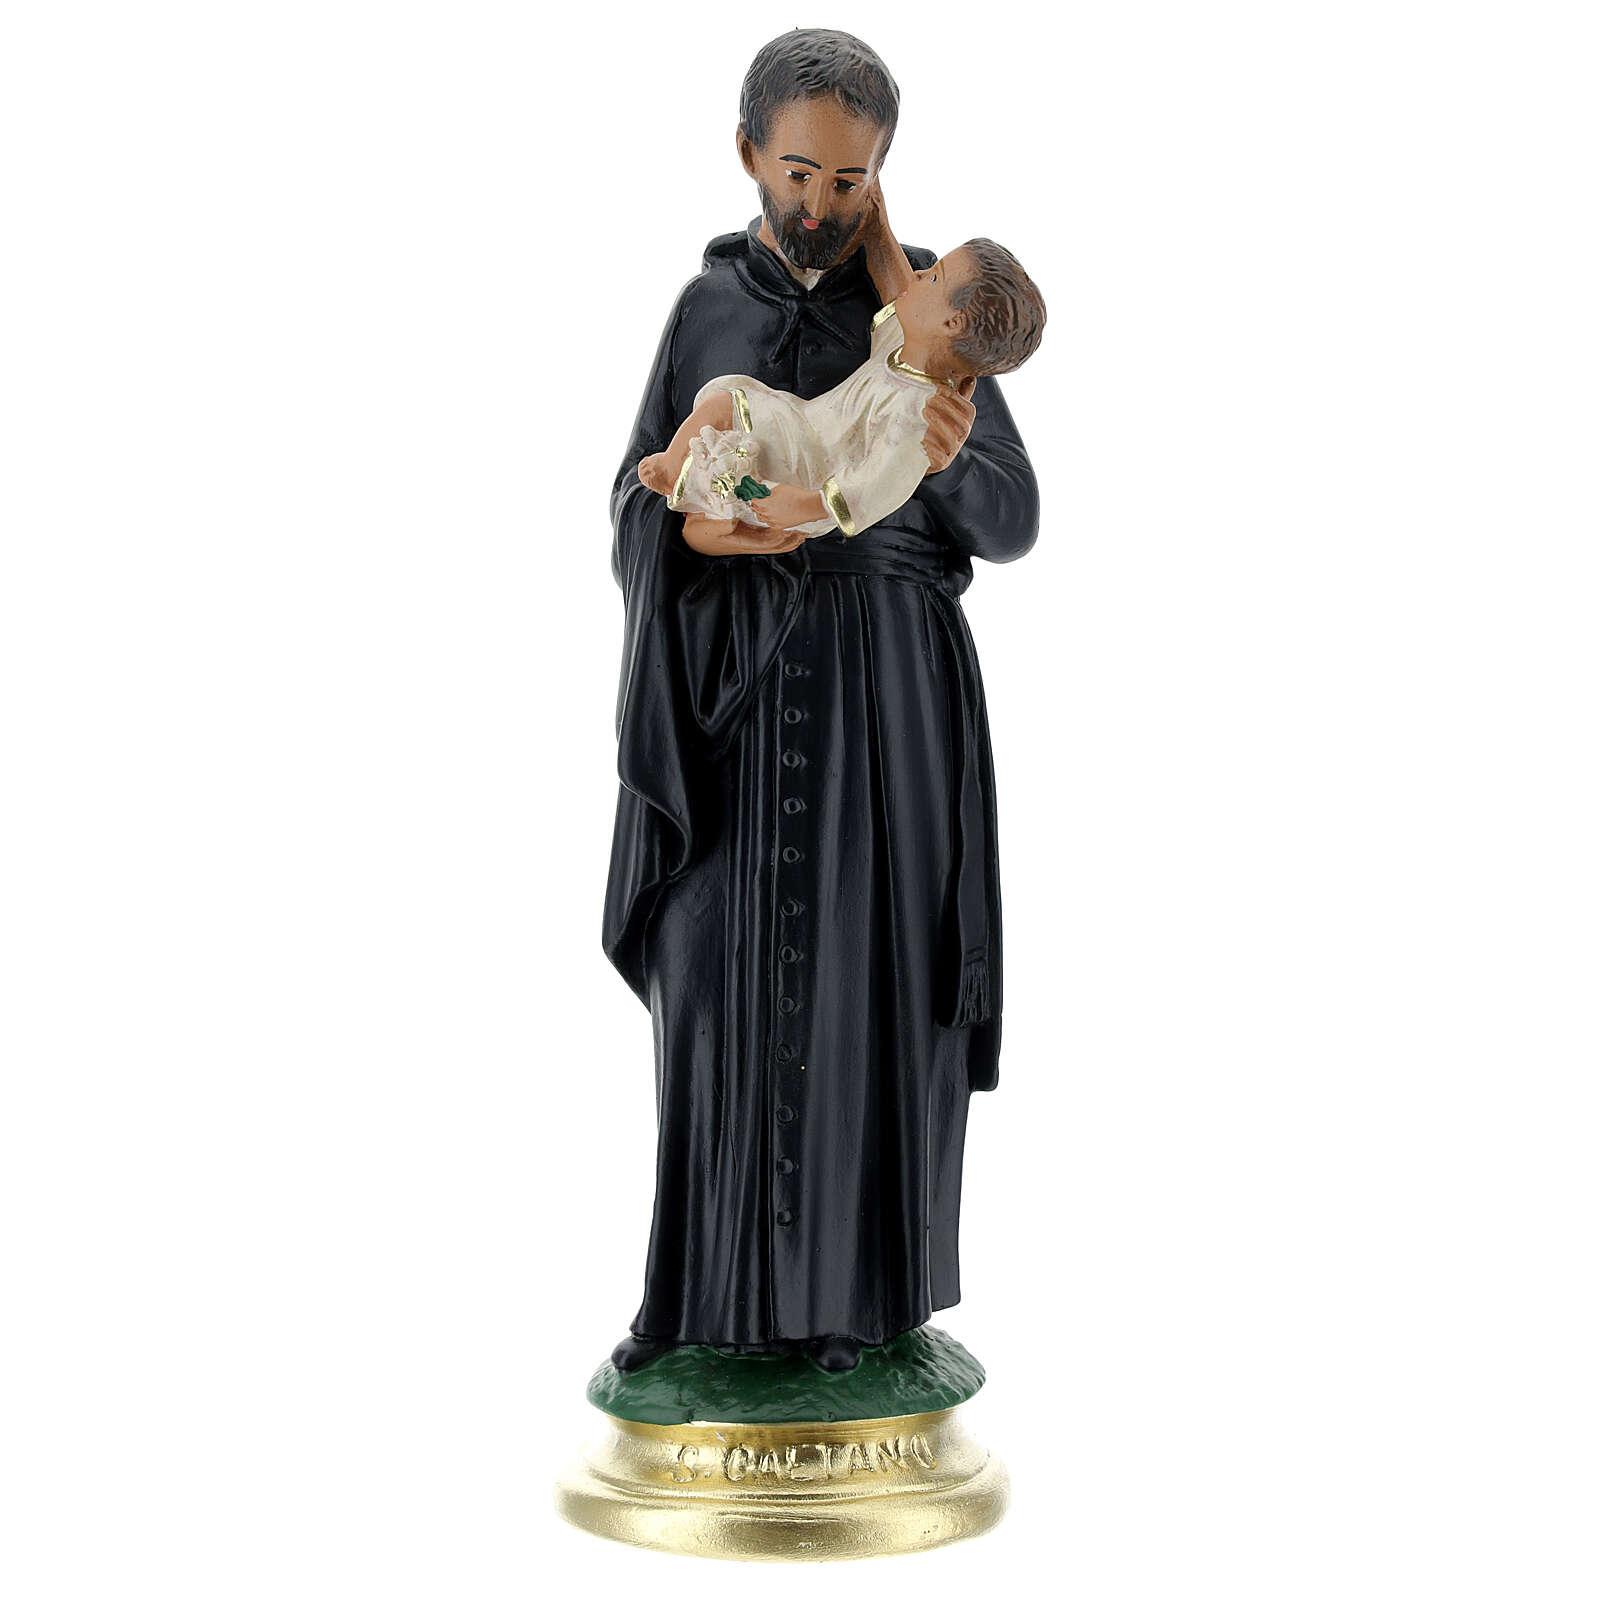 San Gaetano statua 25 cm gesso dipinto a mano Arte Barsanti 4